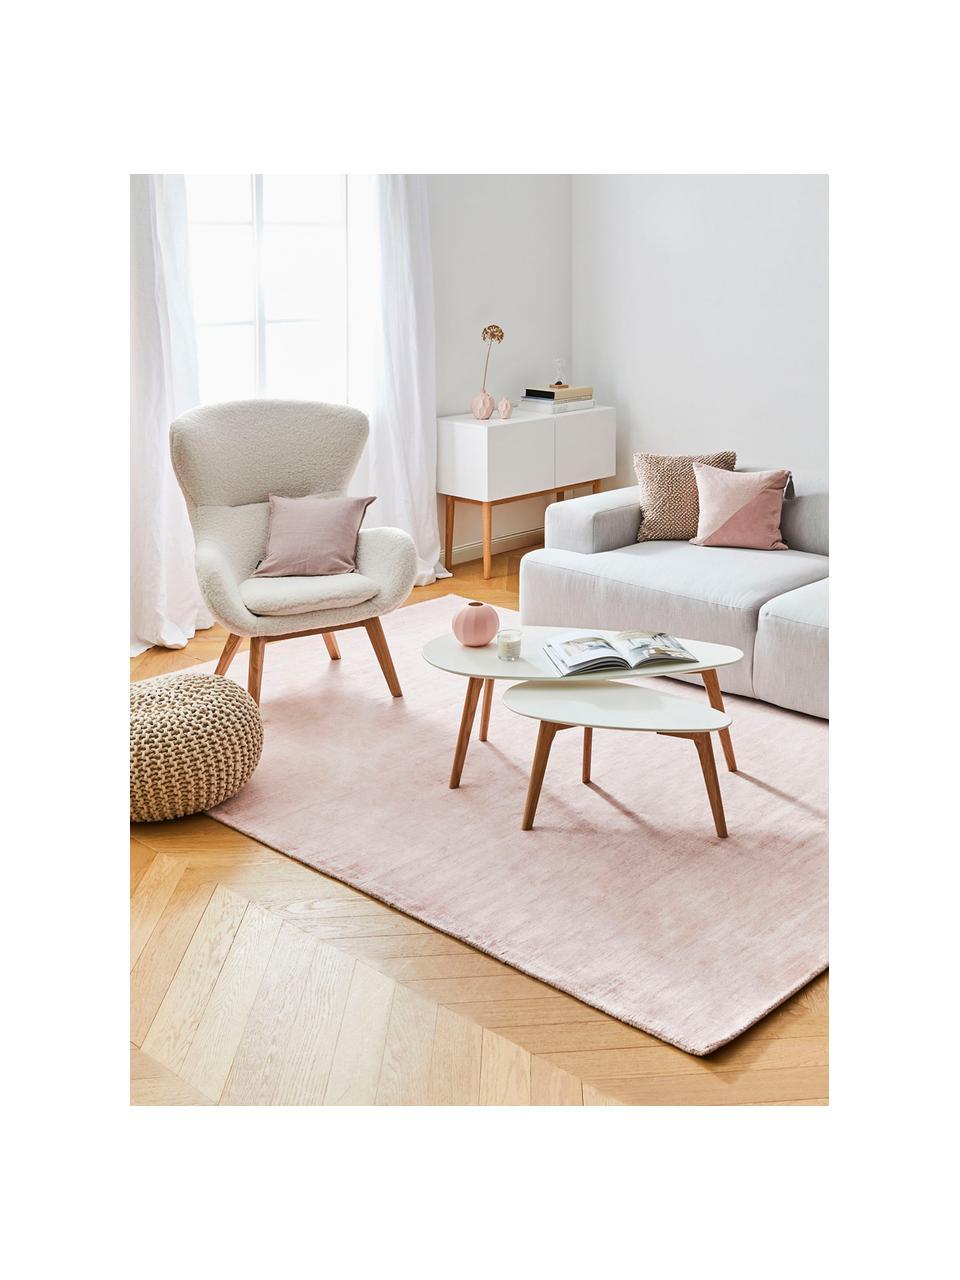 Teddy fauteuil Wing in crèmewit met houten poten, Bekleding: polyester (teddy), Poten: gelakt massief hout met e, Crèmewit, B 77 x D 89 cm